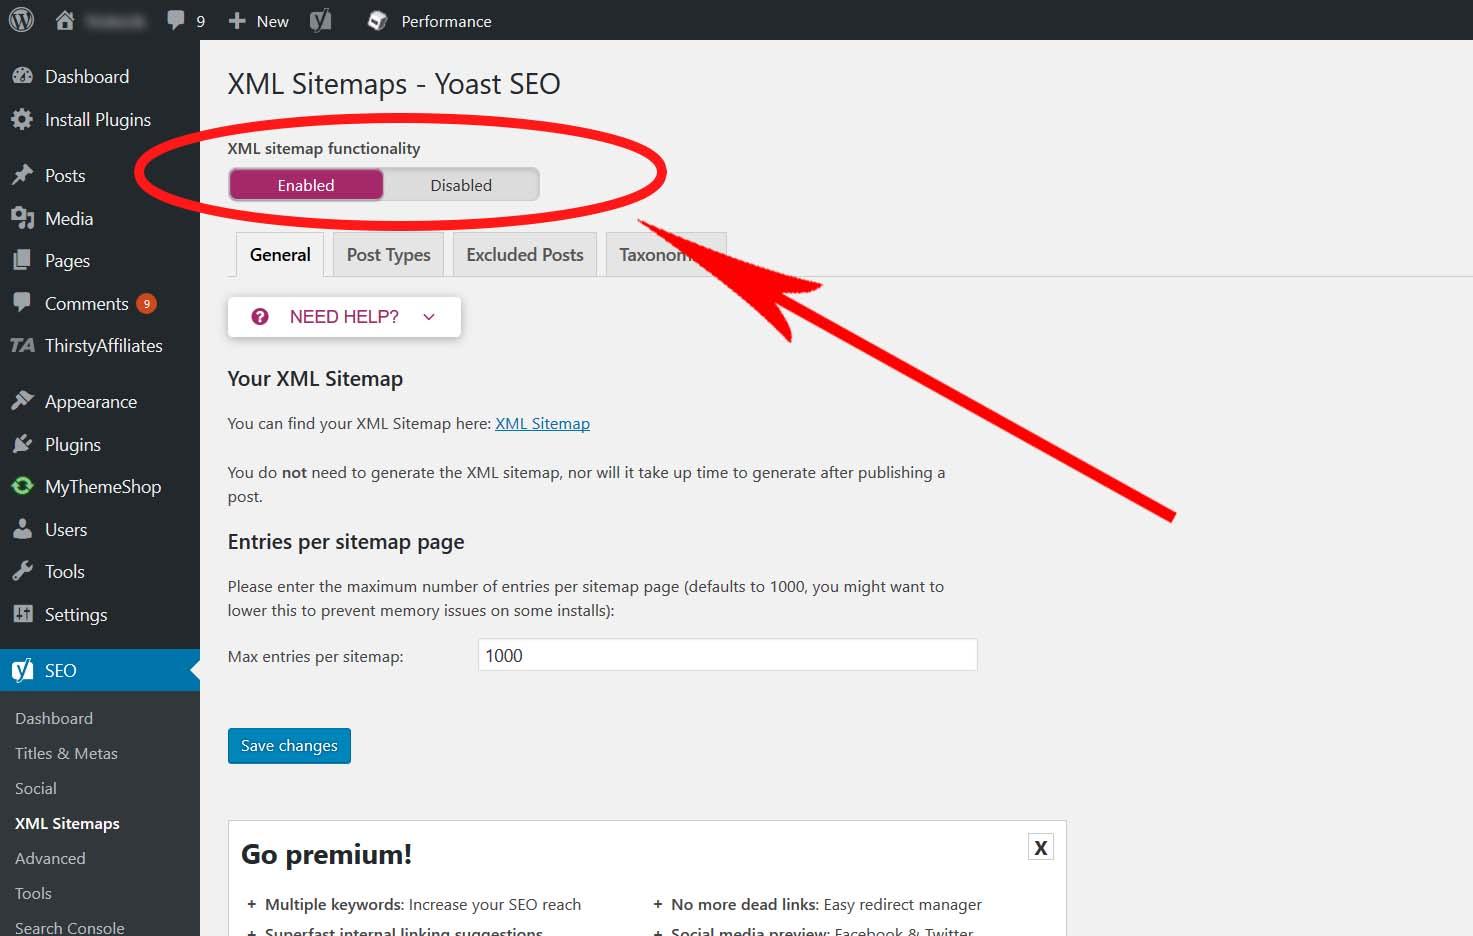 XML yoast Sitemap